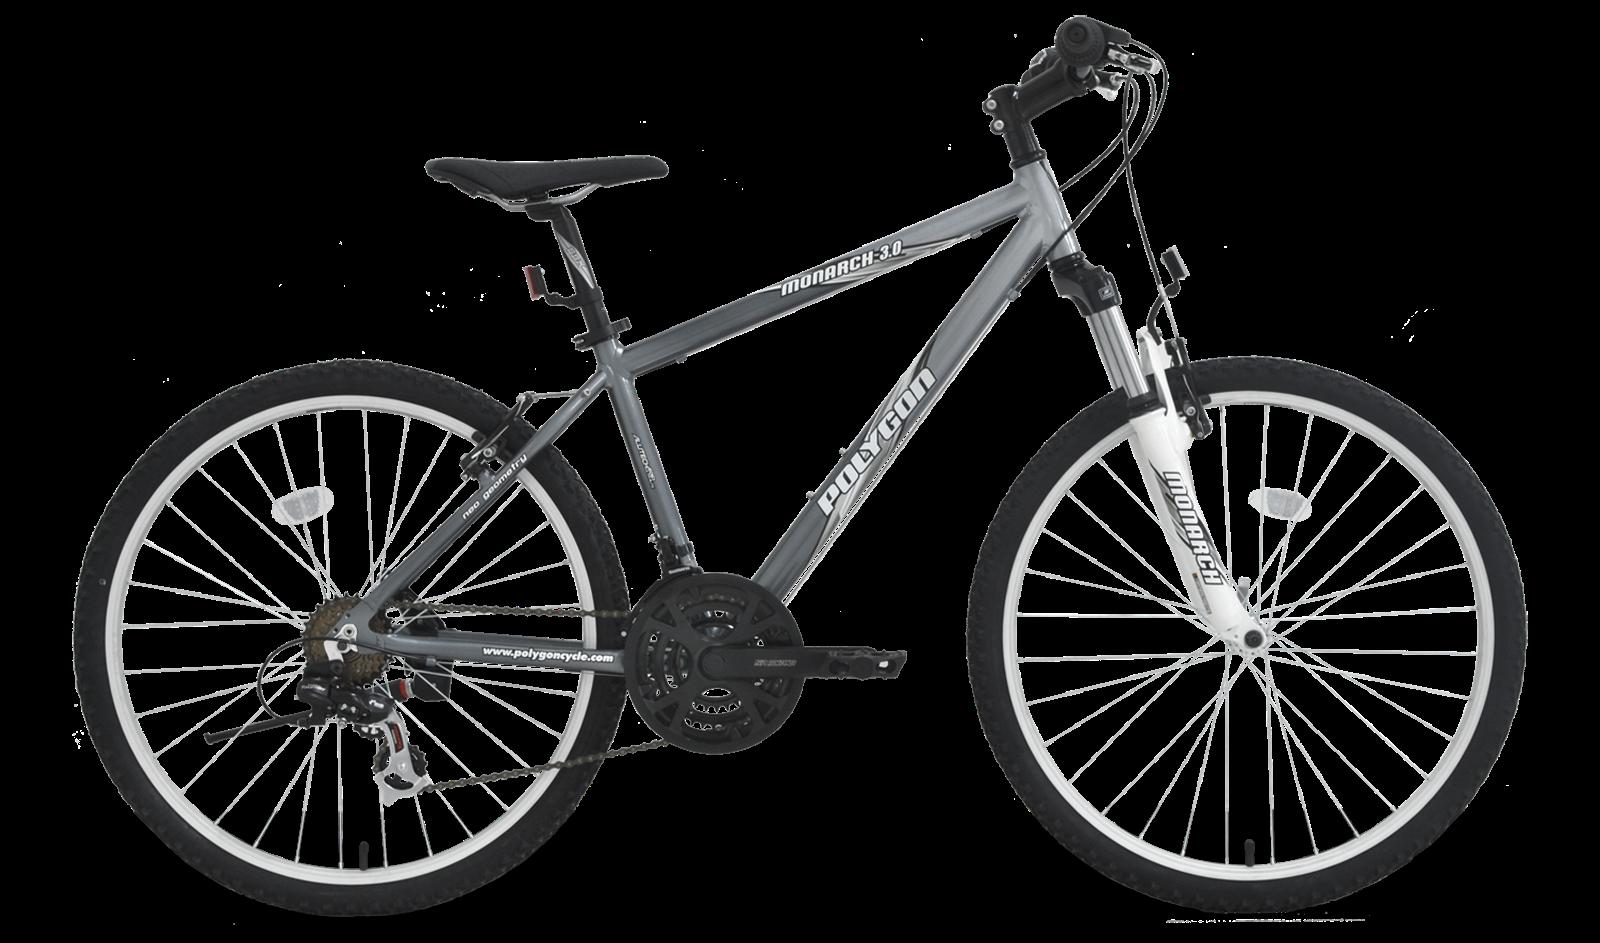 Harga Sepeda Polygon Update AnjangNote